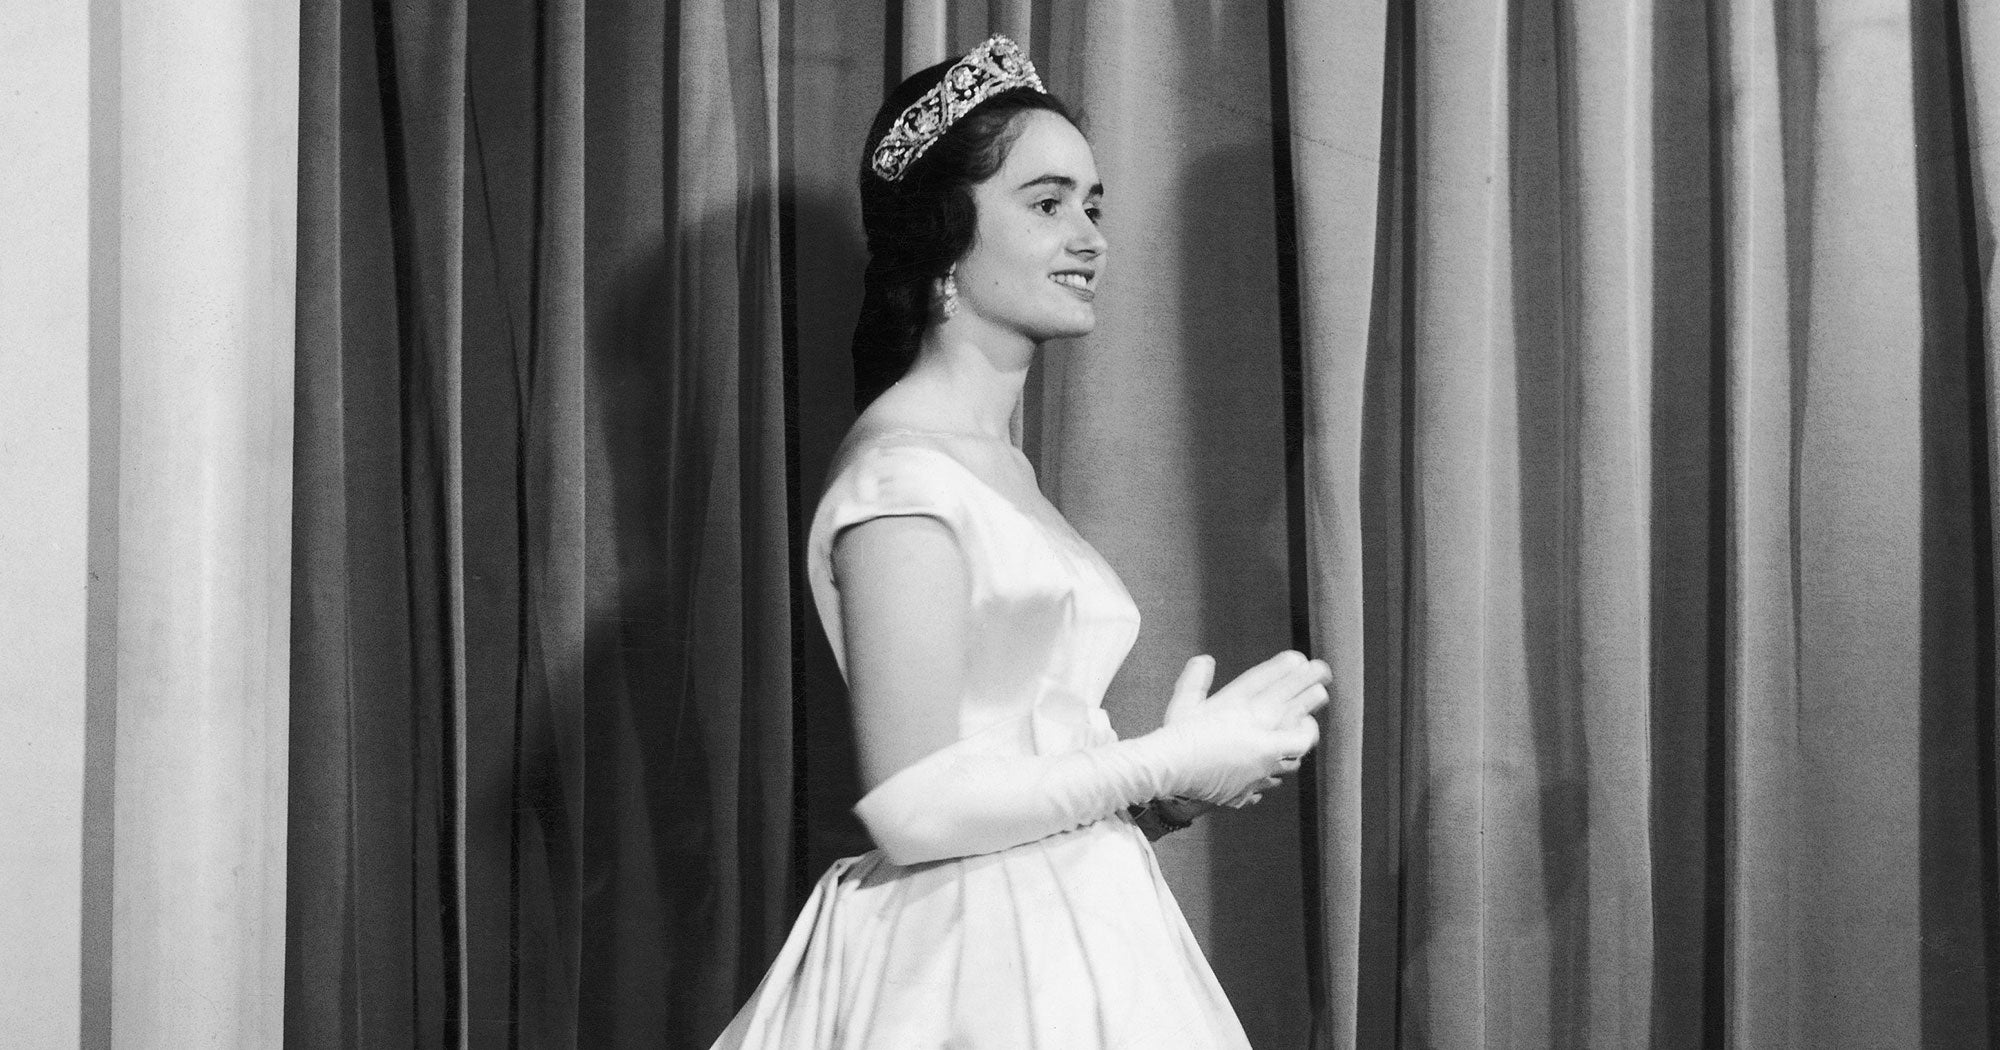 Spain's Red Princess, A Champion Of Women's Rights Progressive Politics, Passes Away From Coronavirus